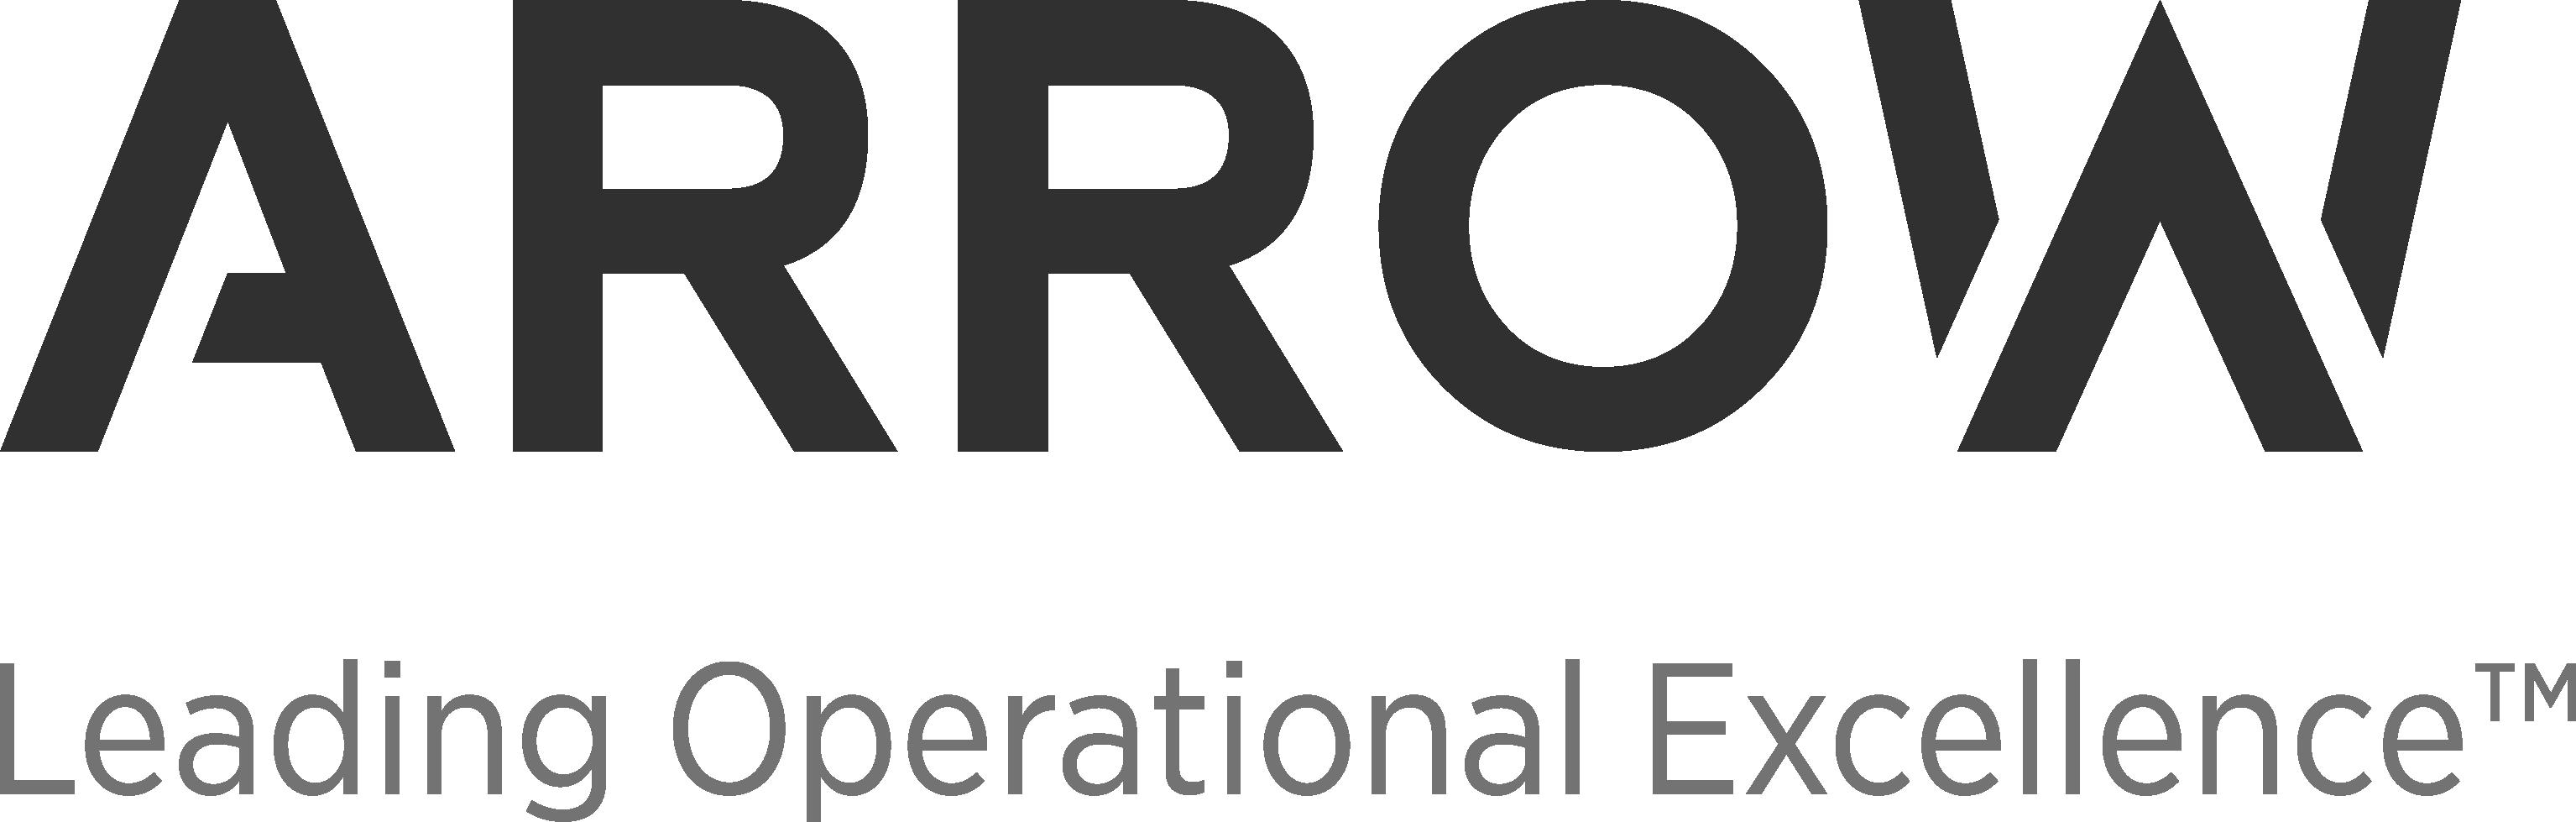 Arrow Engineering Oy logo